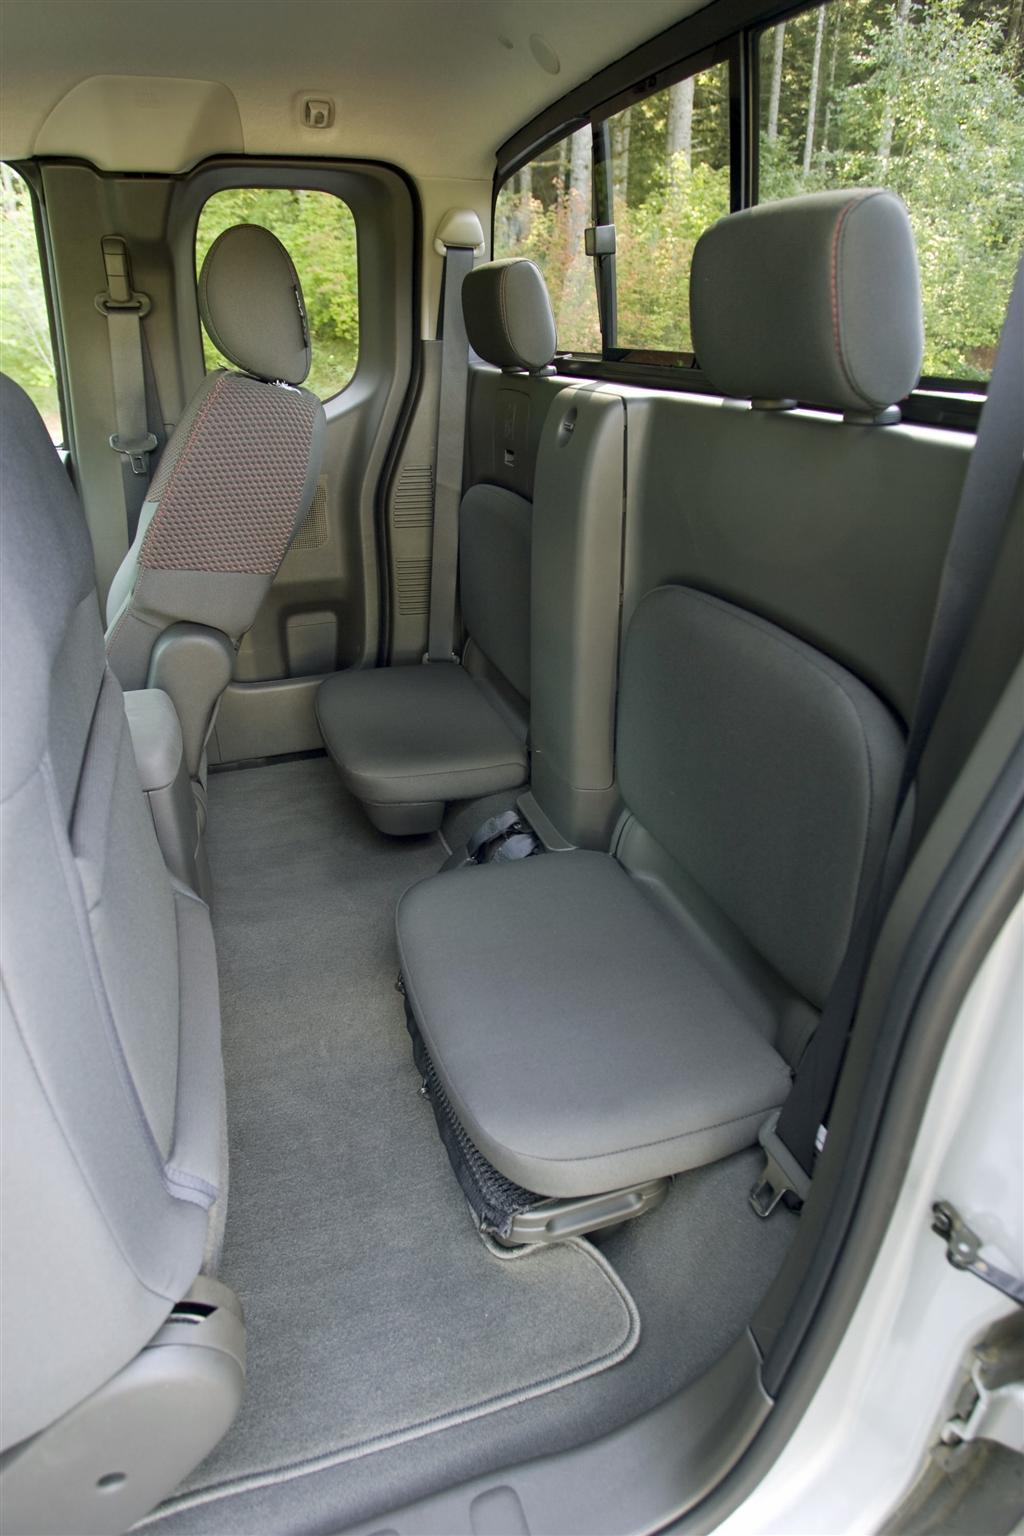 Mid City Nissan >> 2010 Nissan Frontier - conceptcarz.com